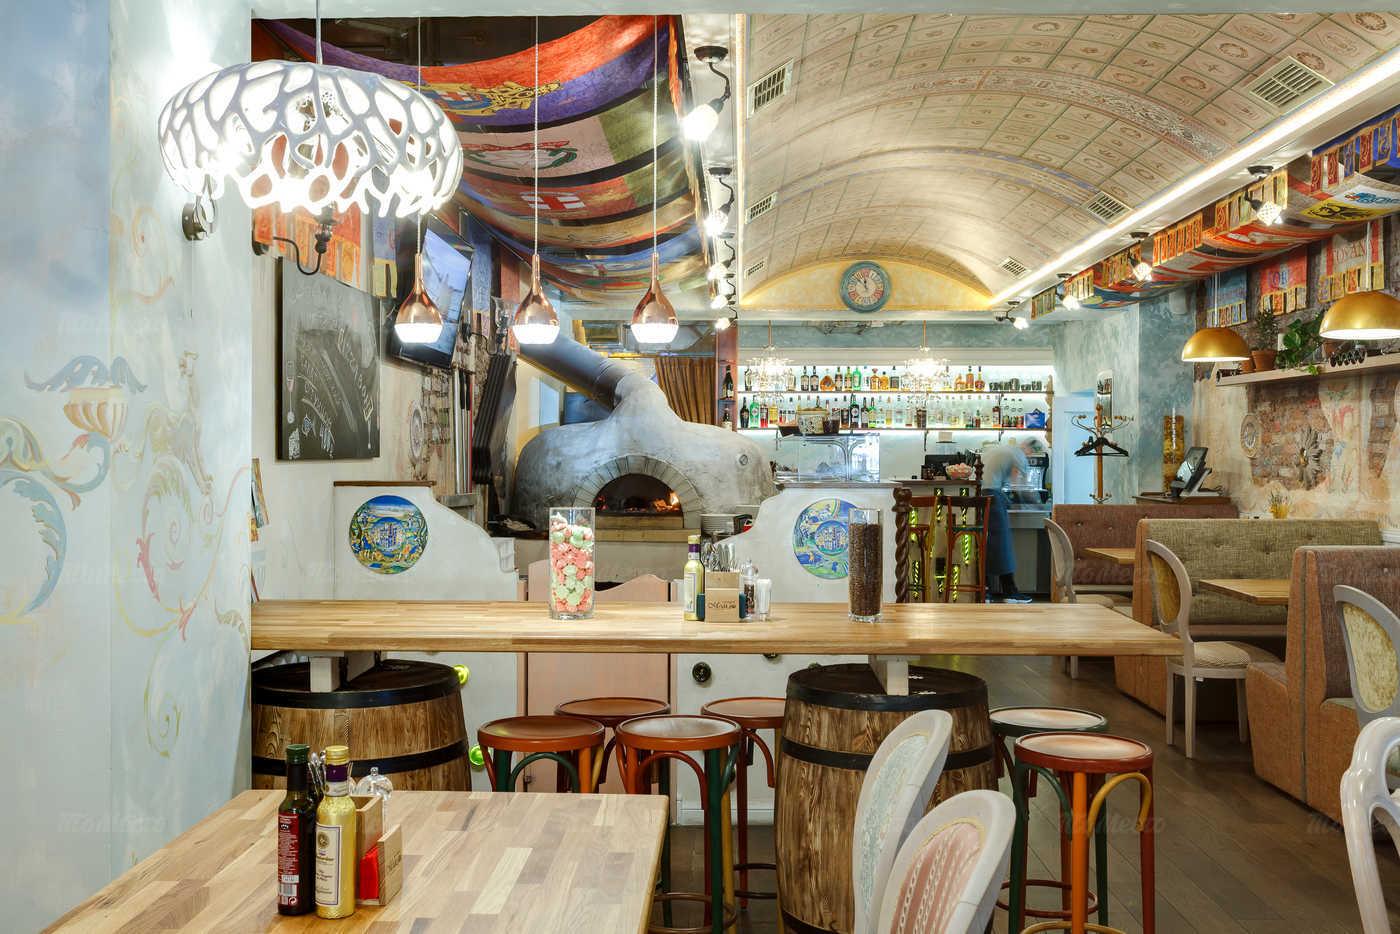 Ресторан Mario Trattoria (Марио Траттория) на Адмиралтейском проспекте фото 6